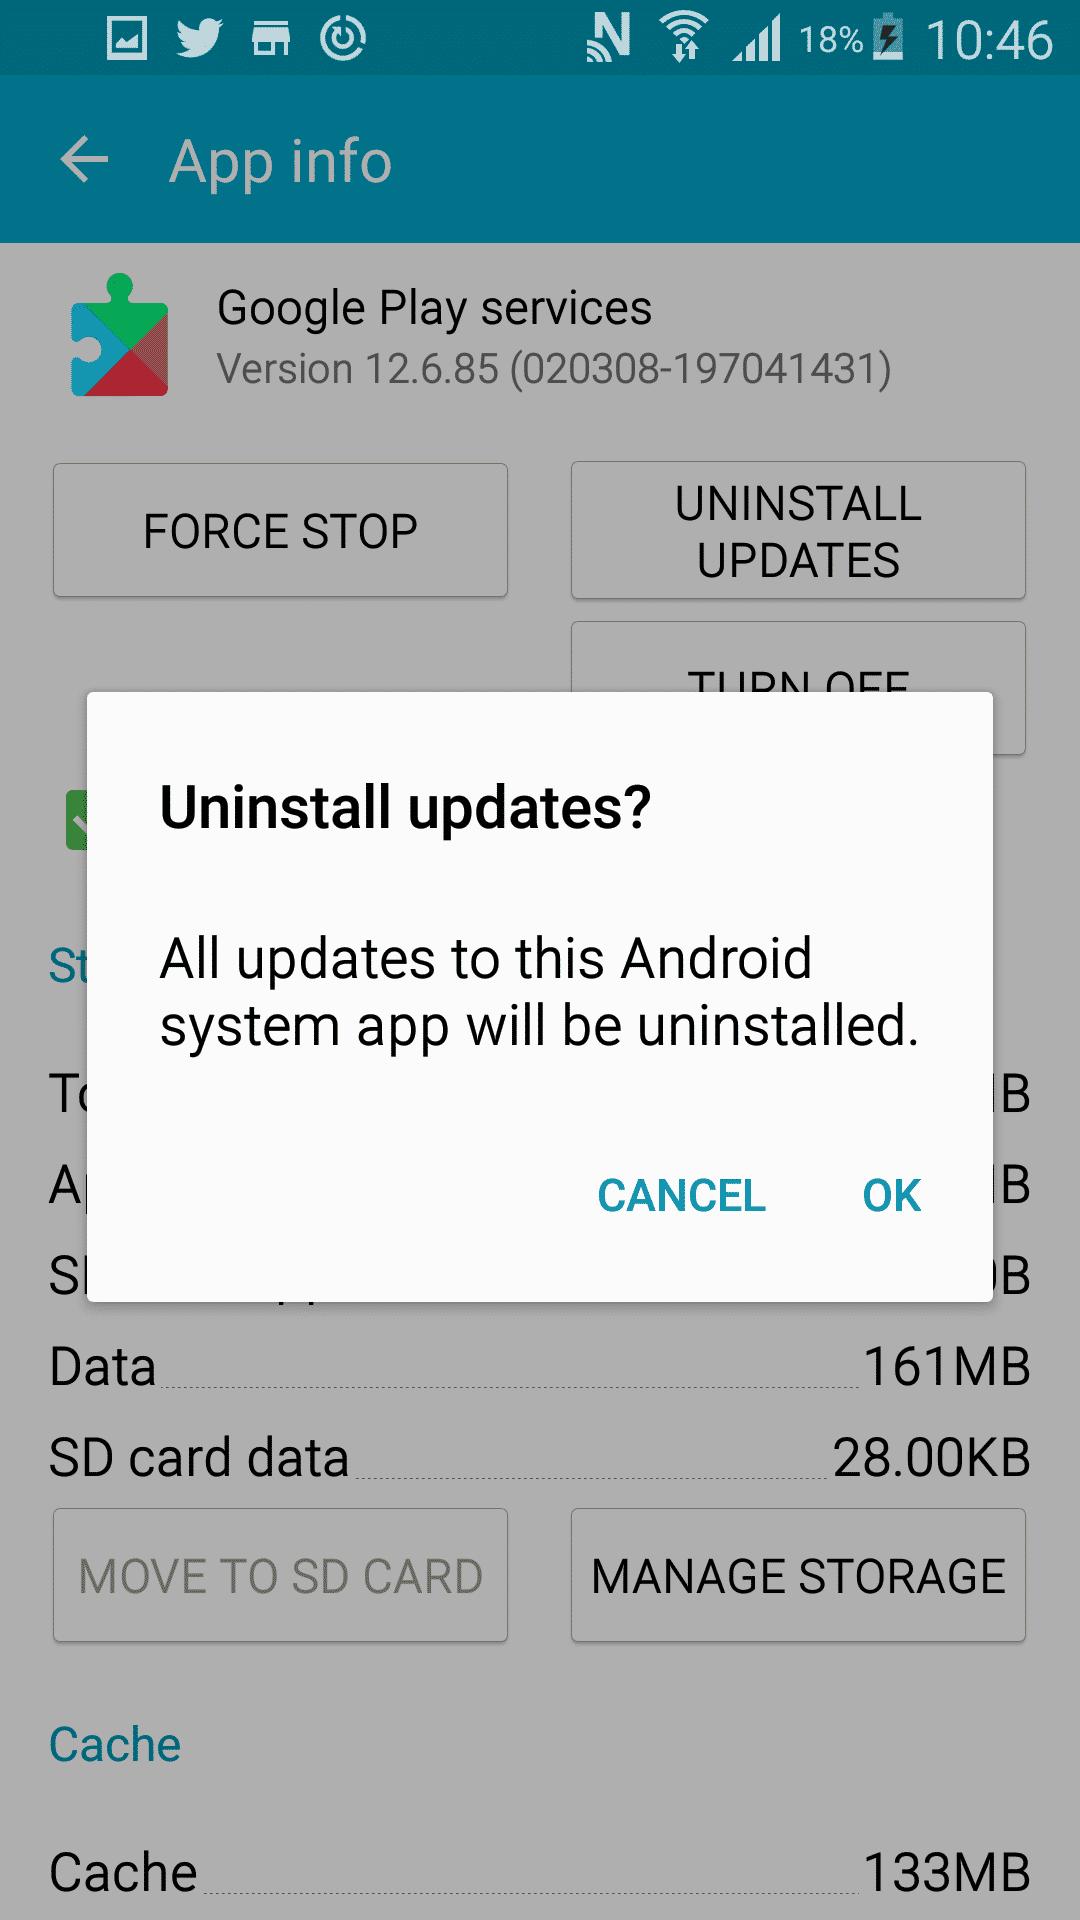 Klik-opsi-Uninstall-Updates-pada-titik-tiga-di-bagian-kanan-layar-atas